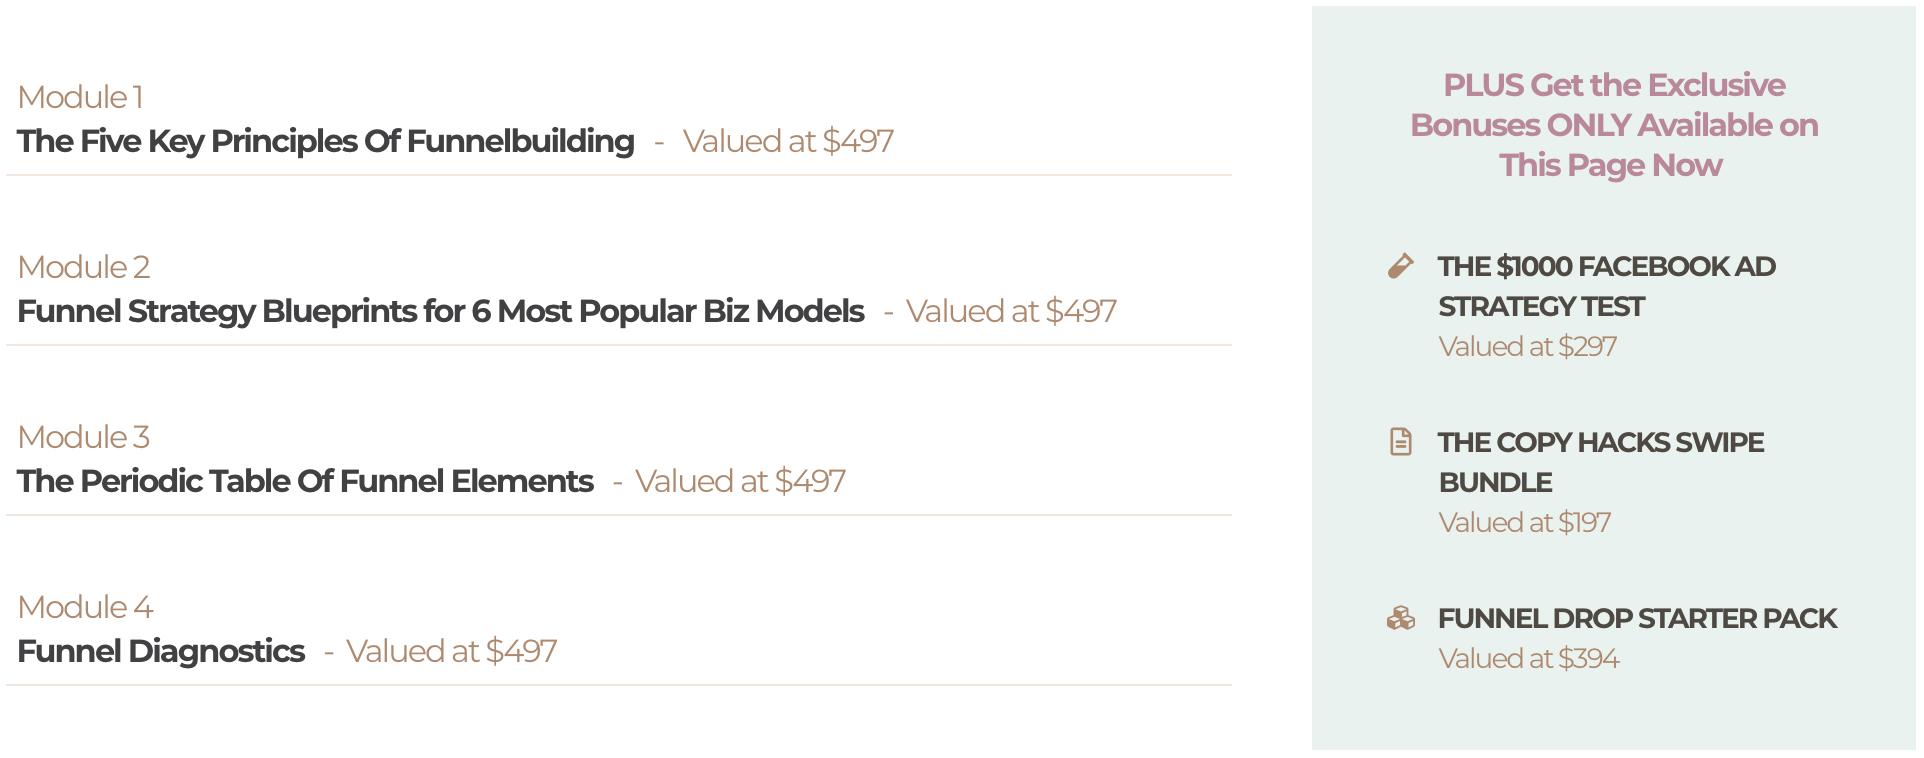 List of Modules and Bonuses